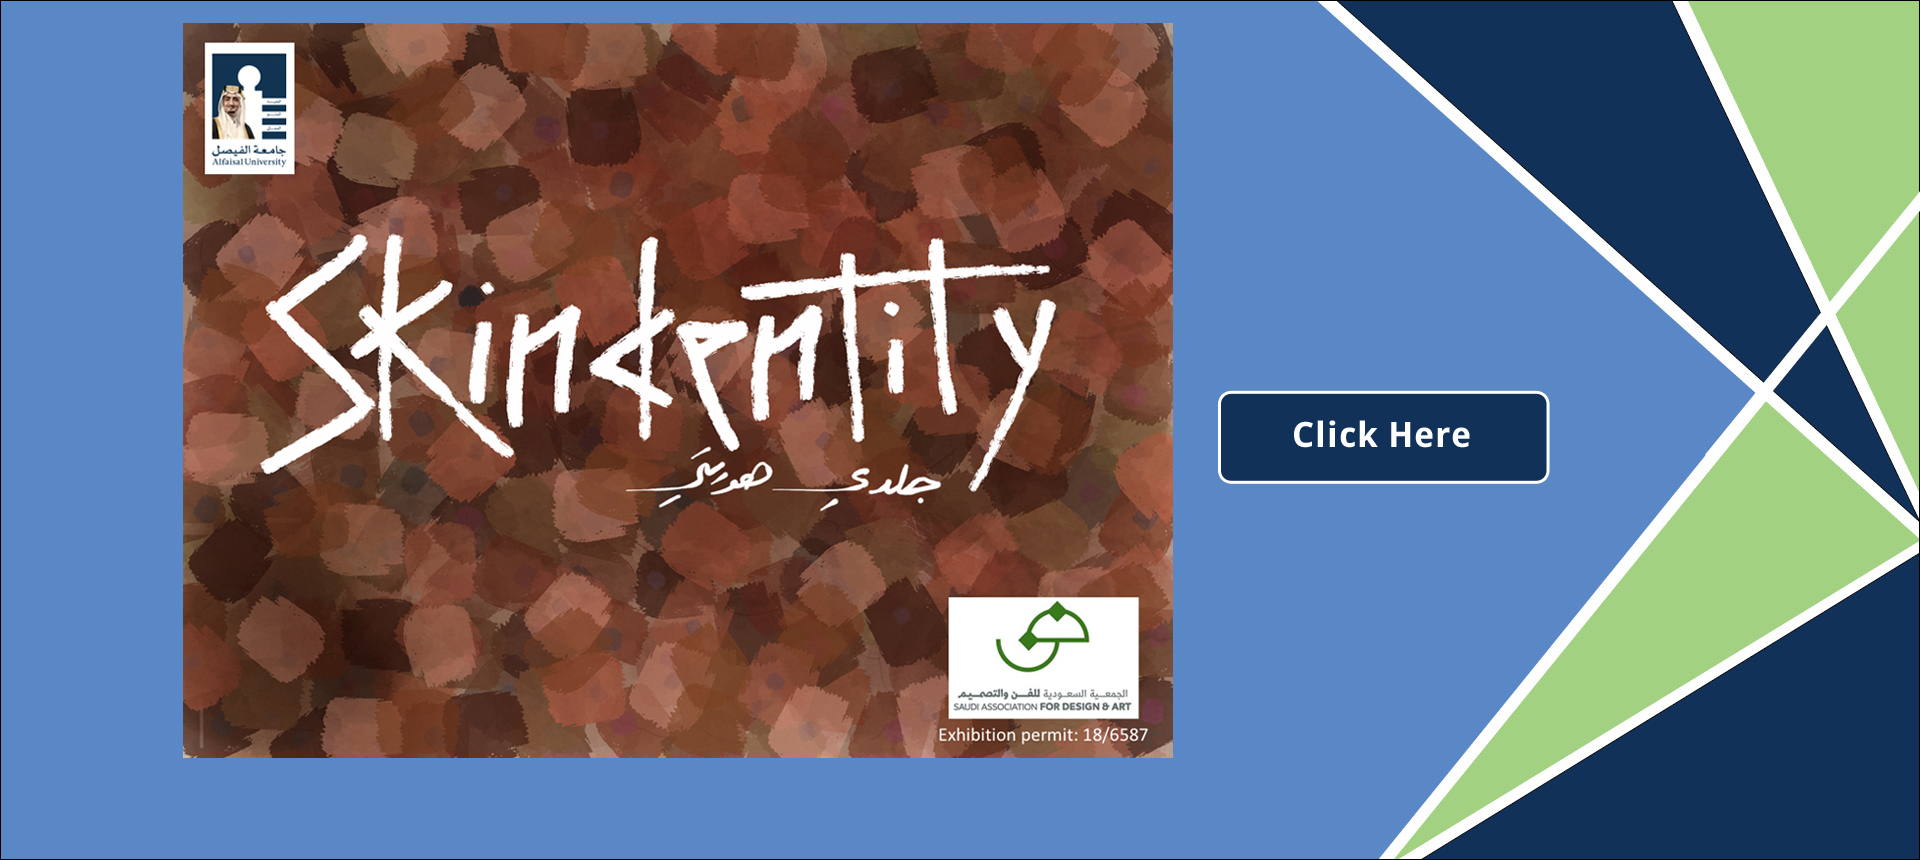 skindentity